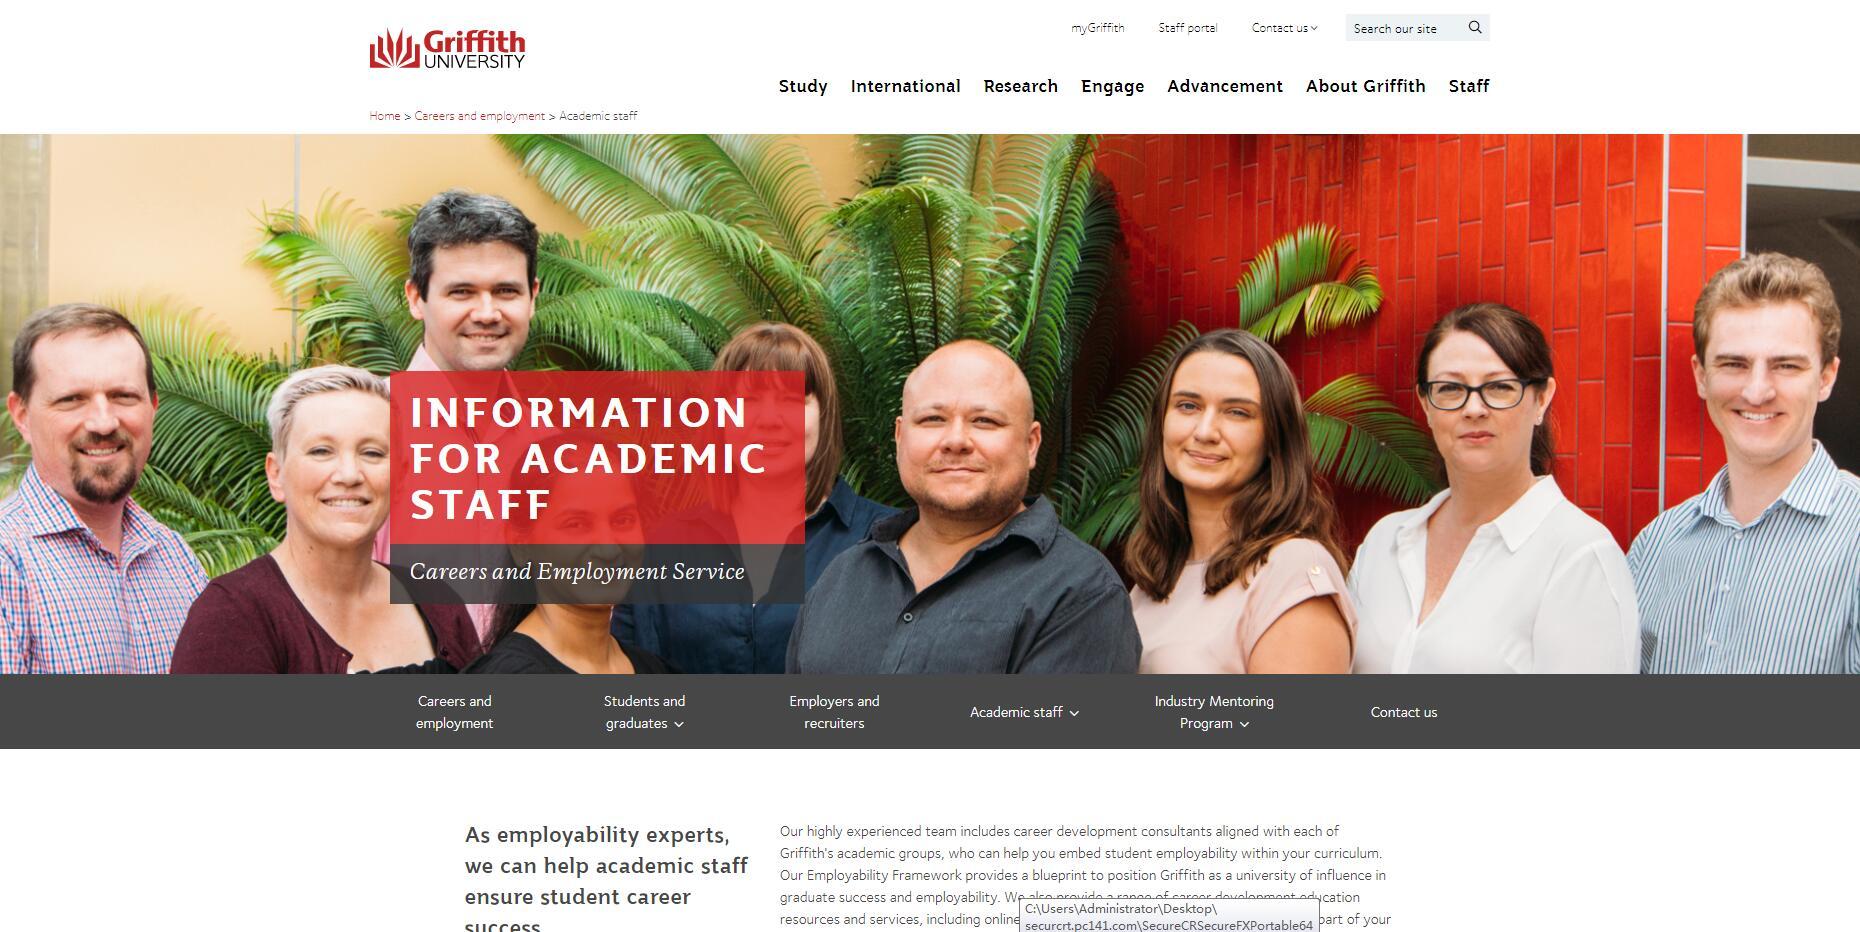 Academic staff - Griffith University